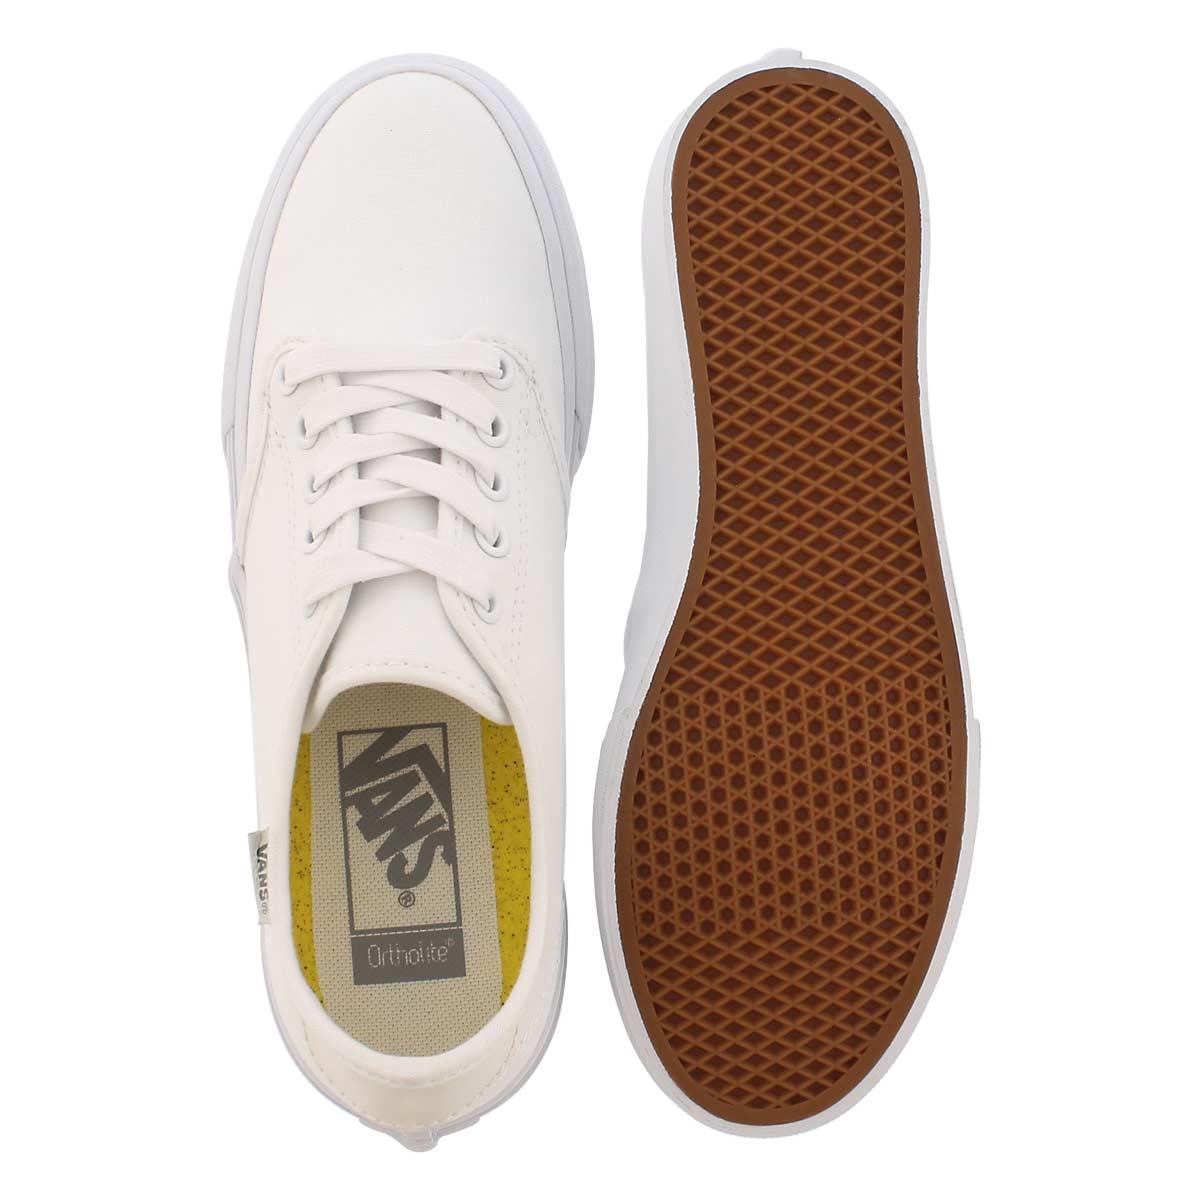 Lds Camden Deluxe wht/wht laceup sneaker